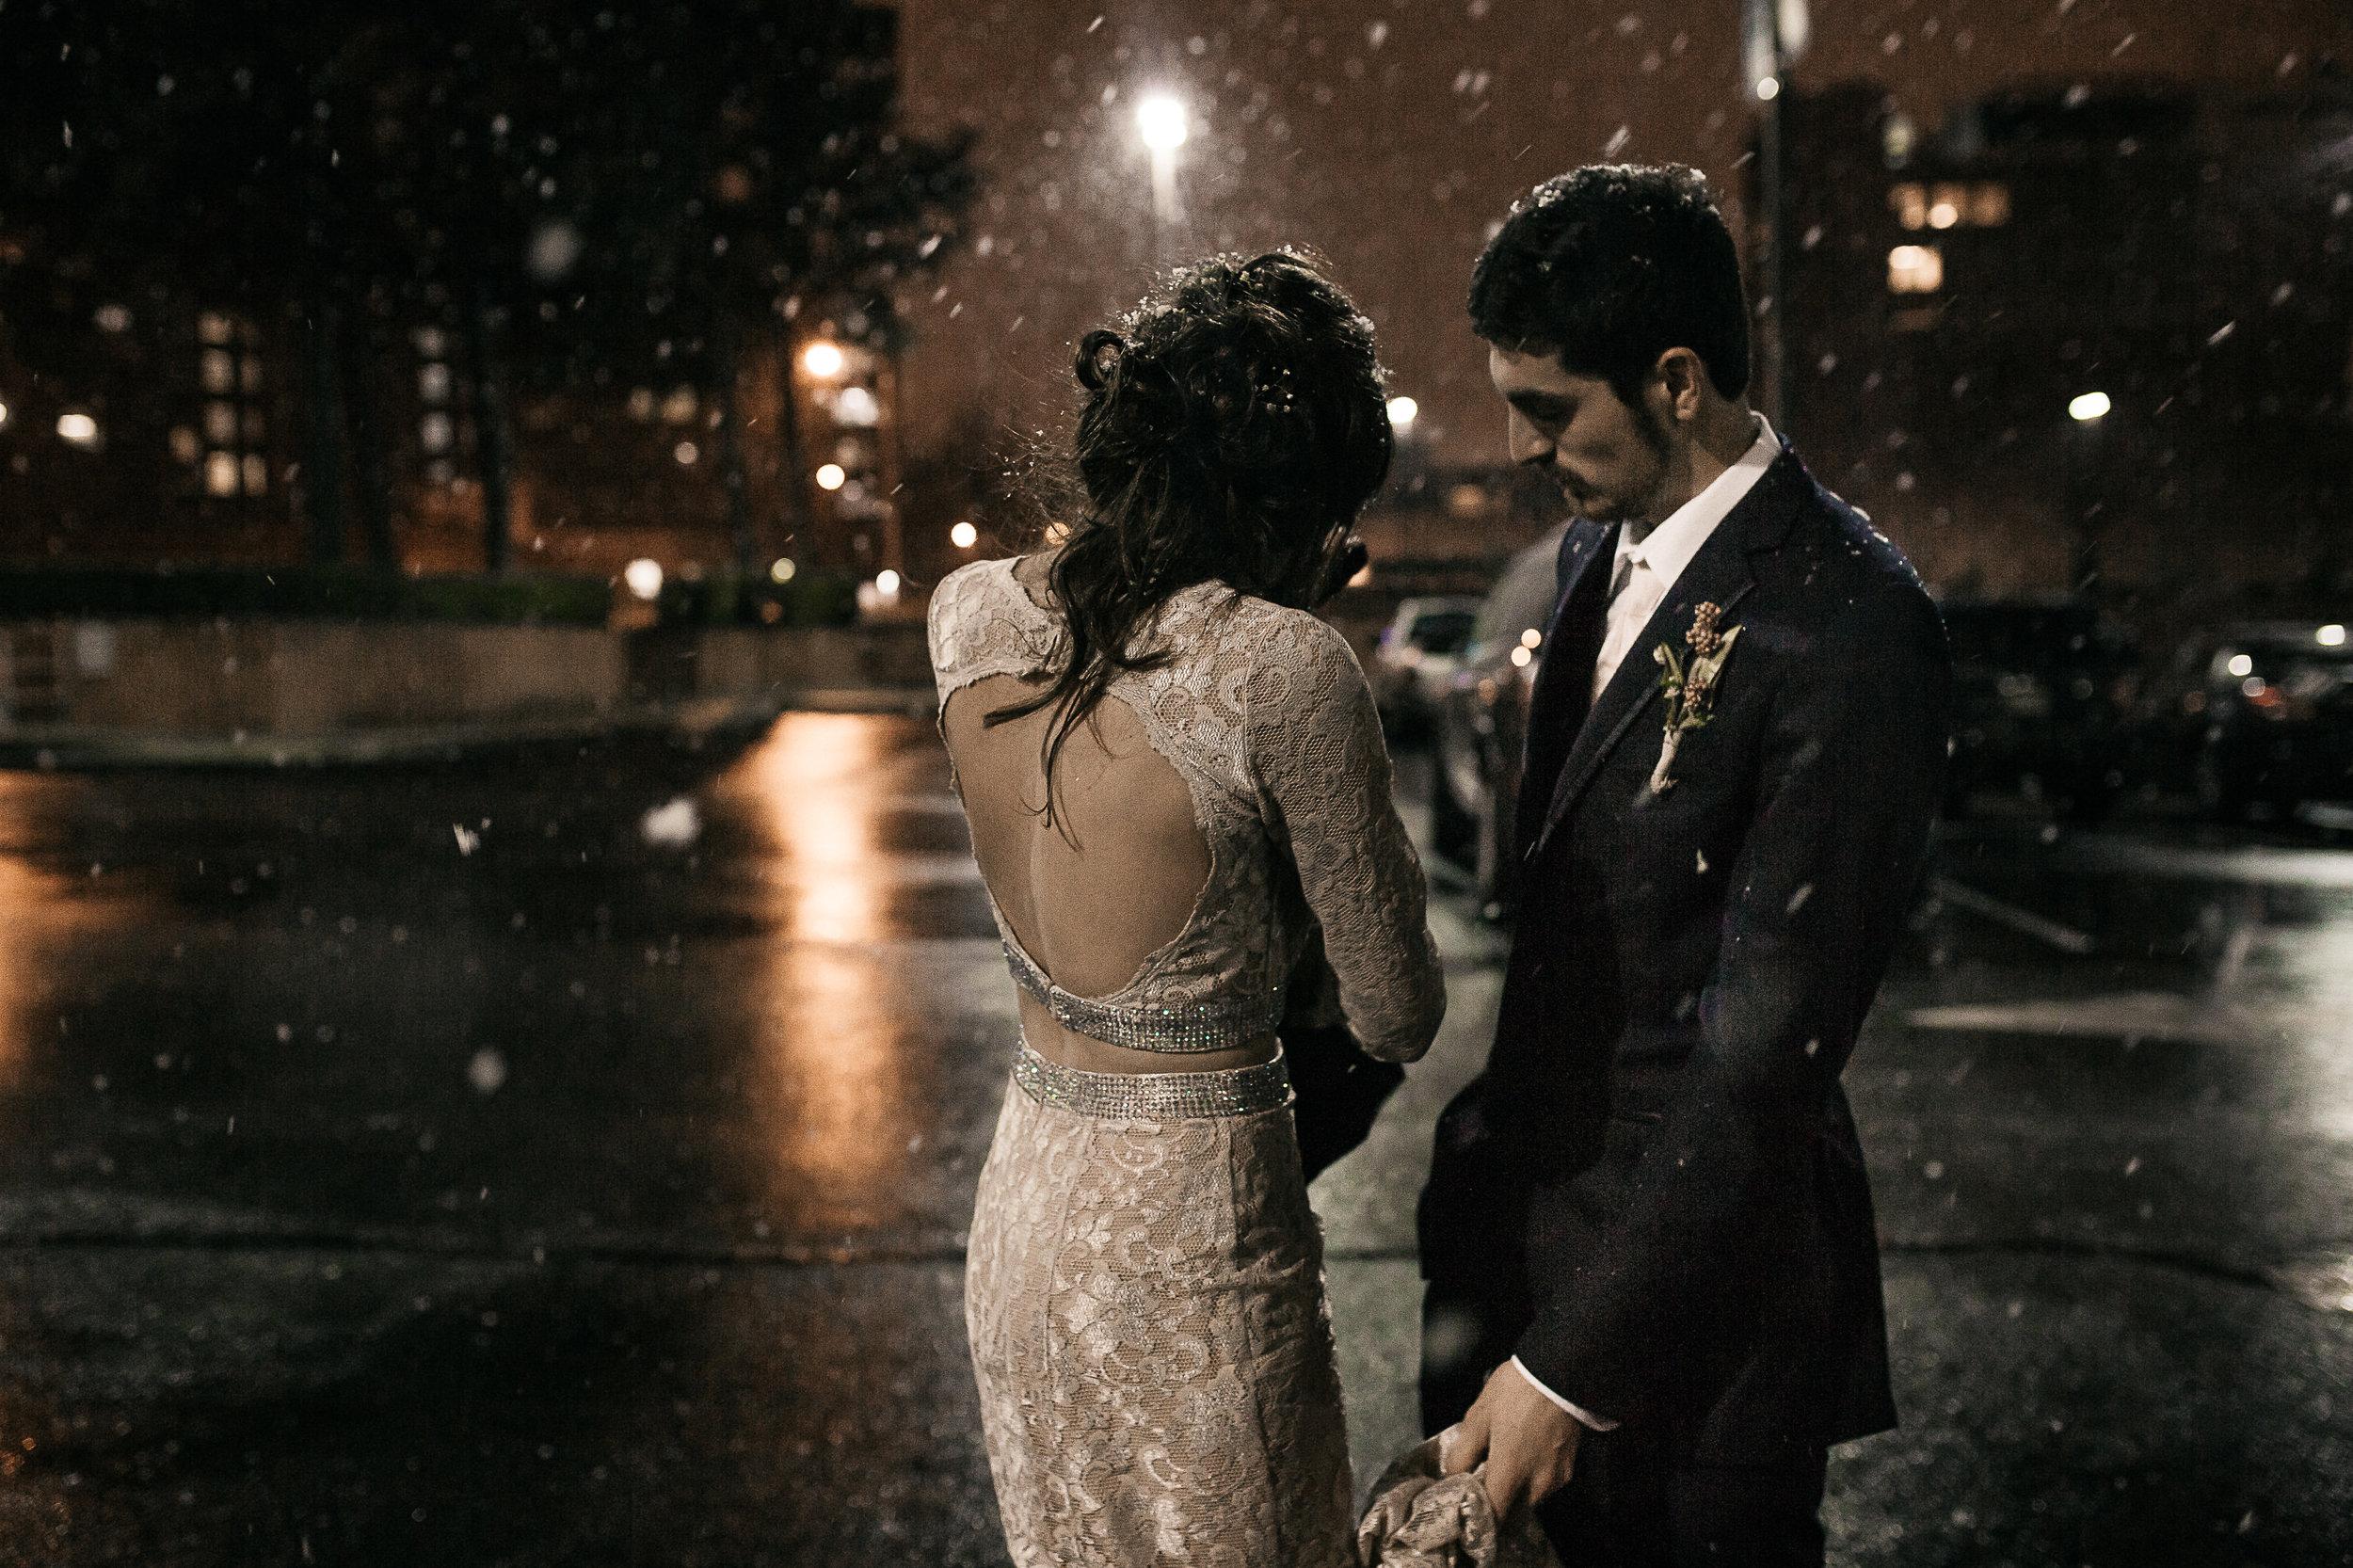 memphis-wedding-photographer-snow-loya-wedding-327.jpg